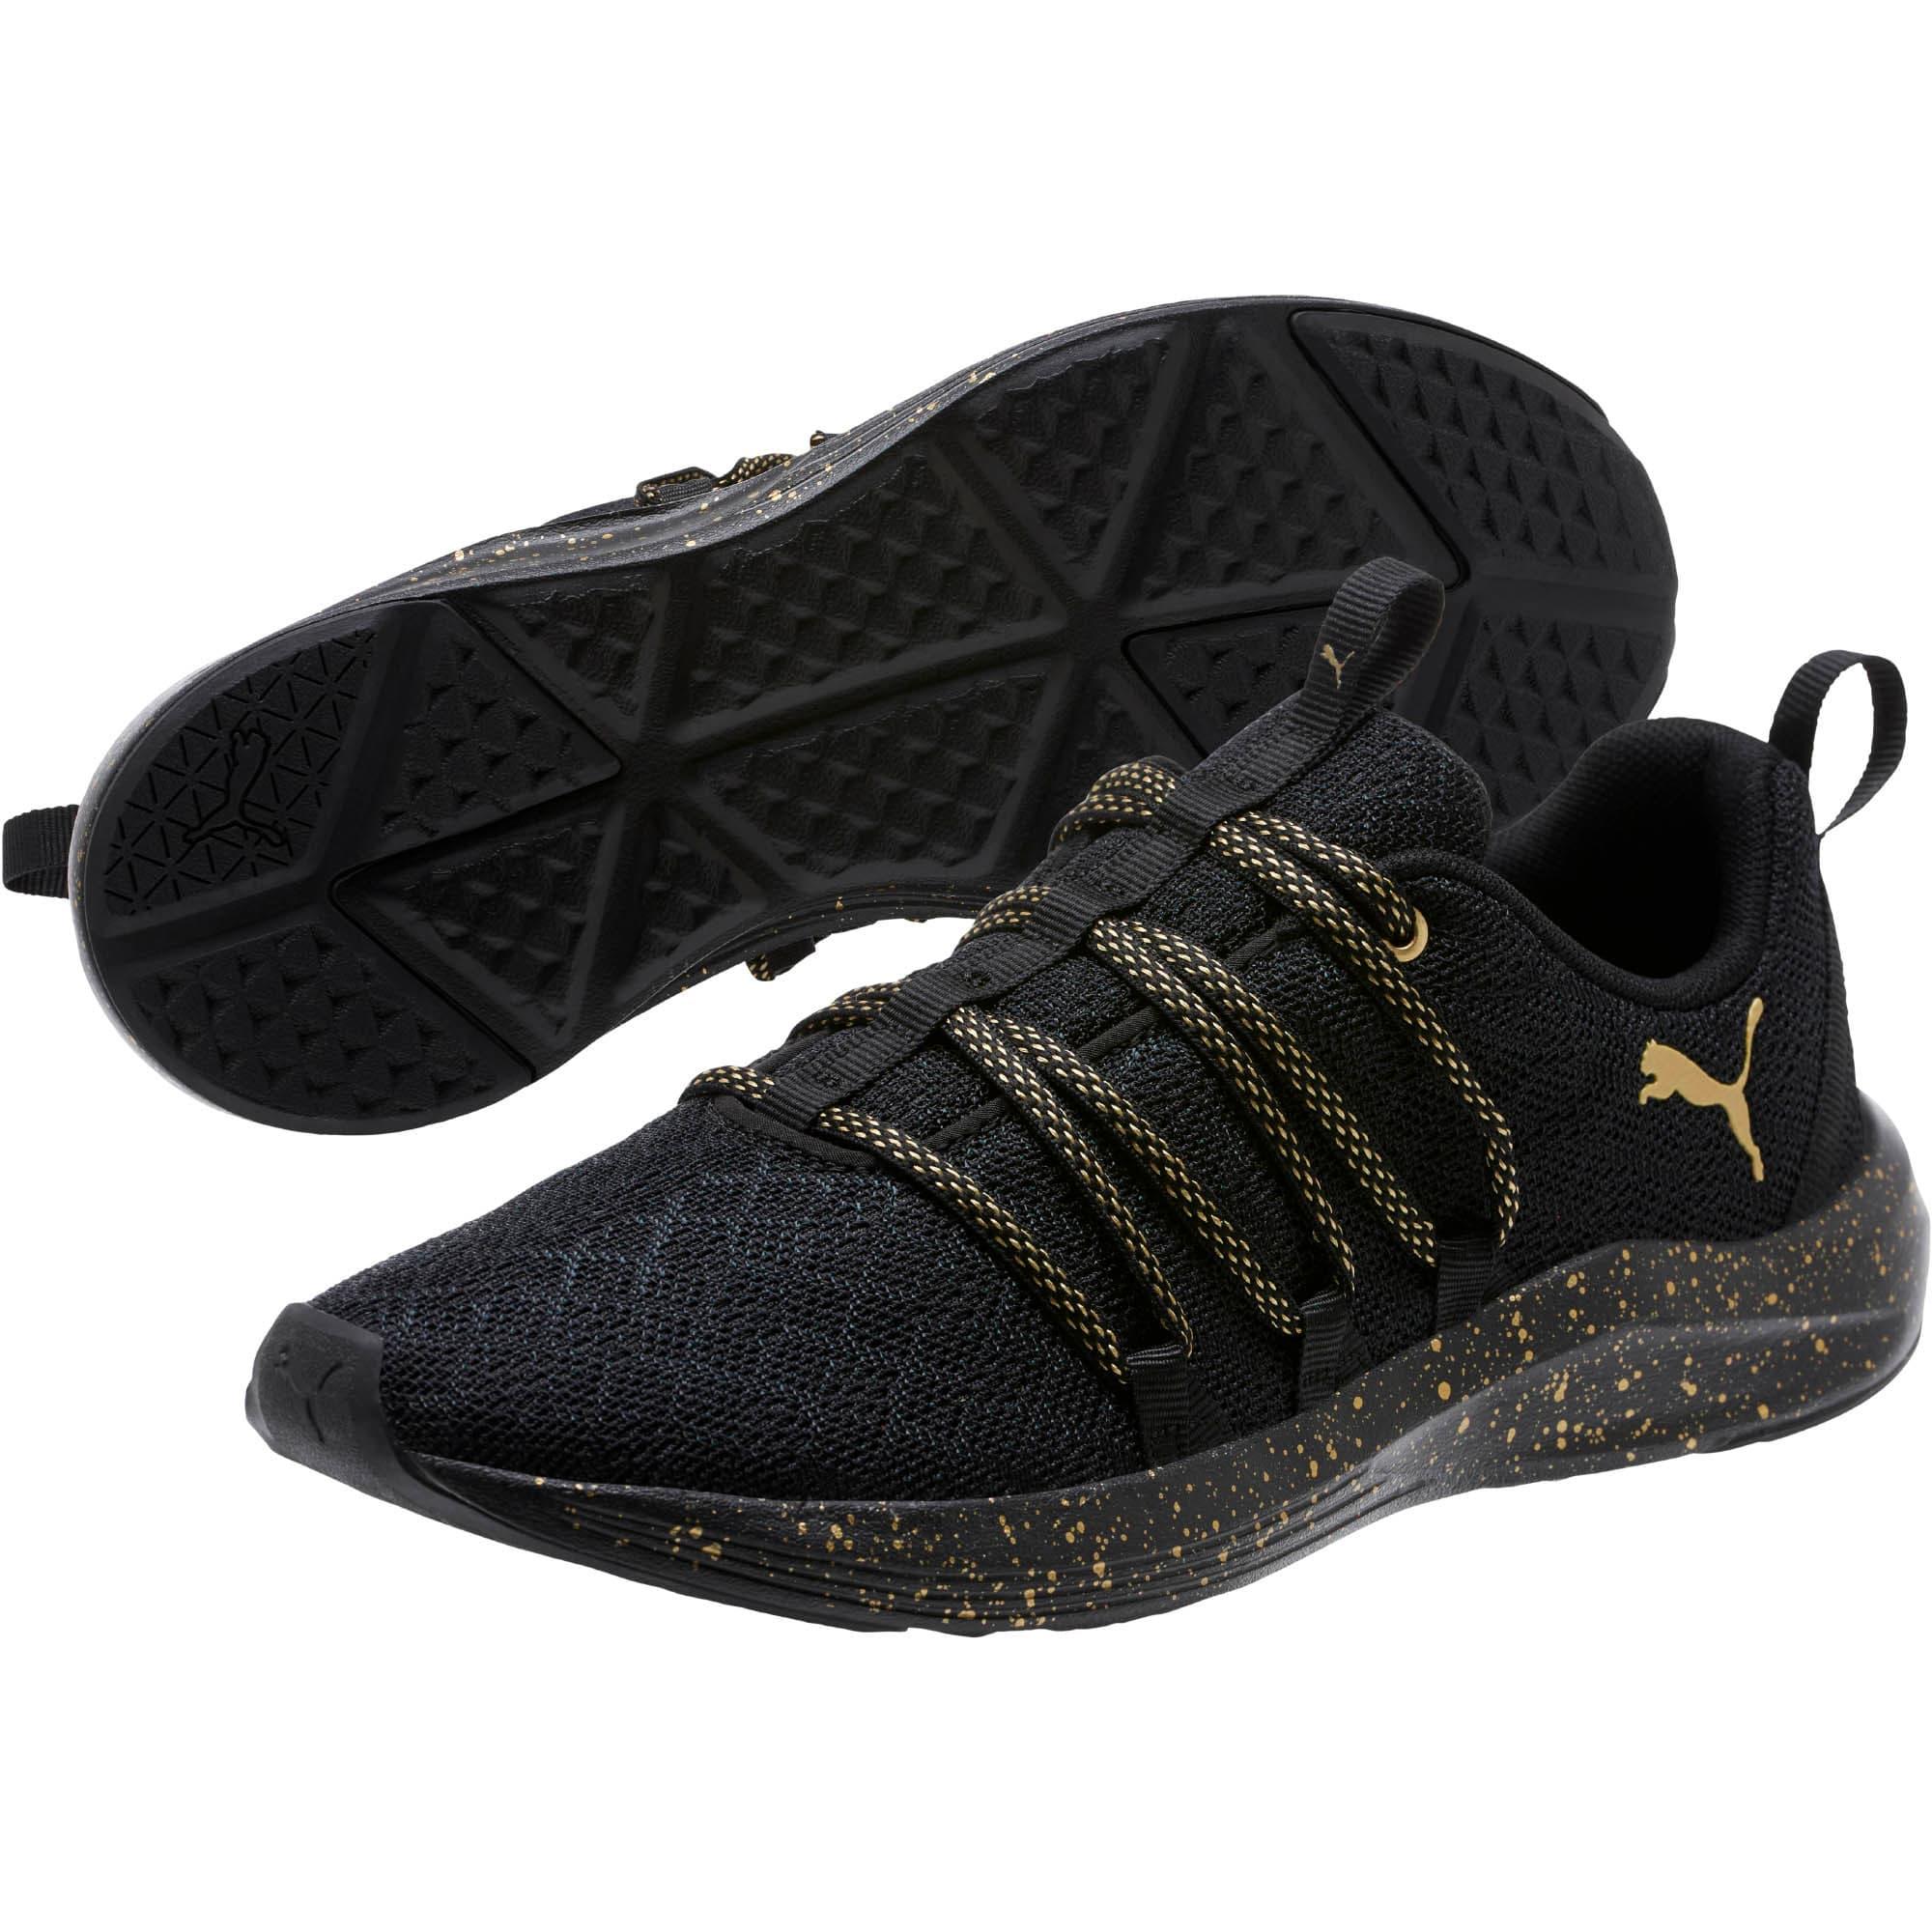 Thumbnail 2 of Prowl Alt Mesh Speckle Women's Training Shoes, Puma Black-Puma Team Gold, medium